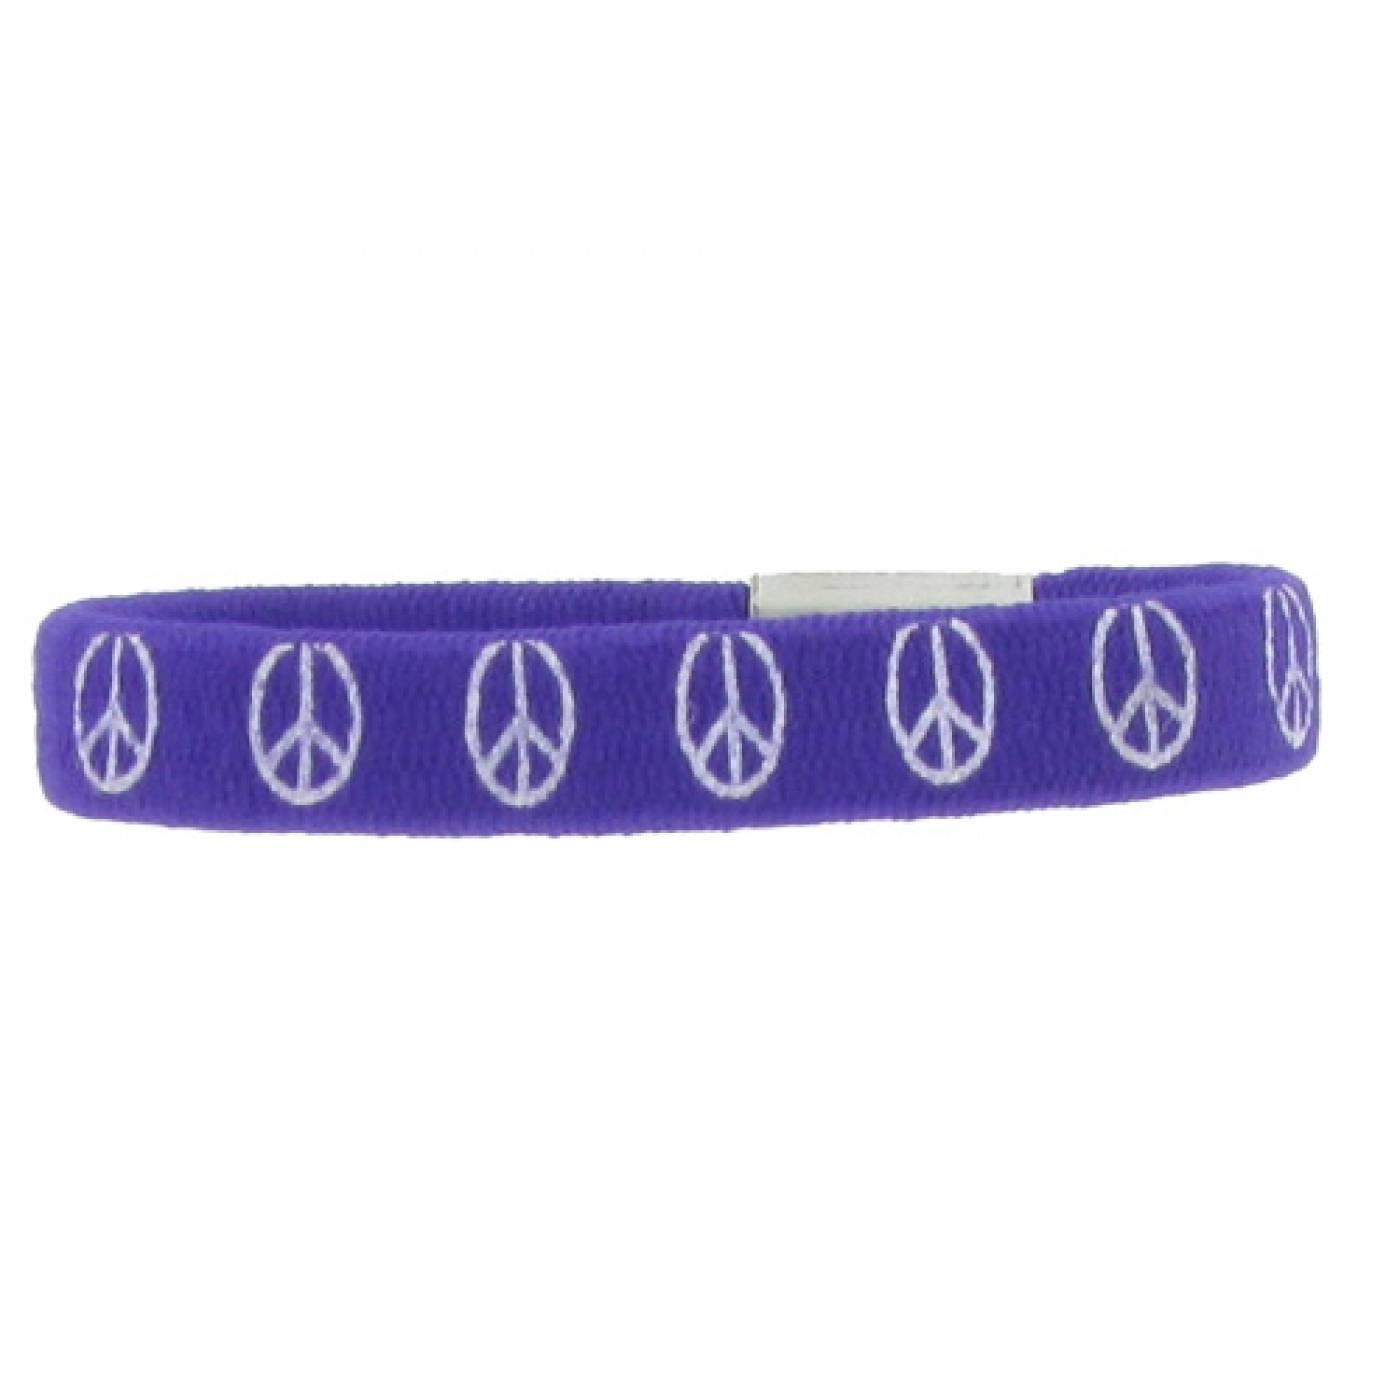 armband friedenszeichen kind peace gummi violett. Black Bedroom Furniture Sets. Home Design Ideas